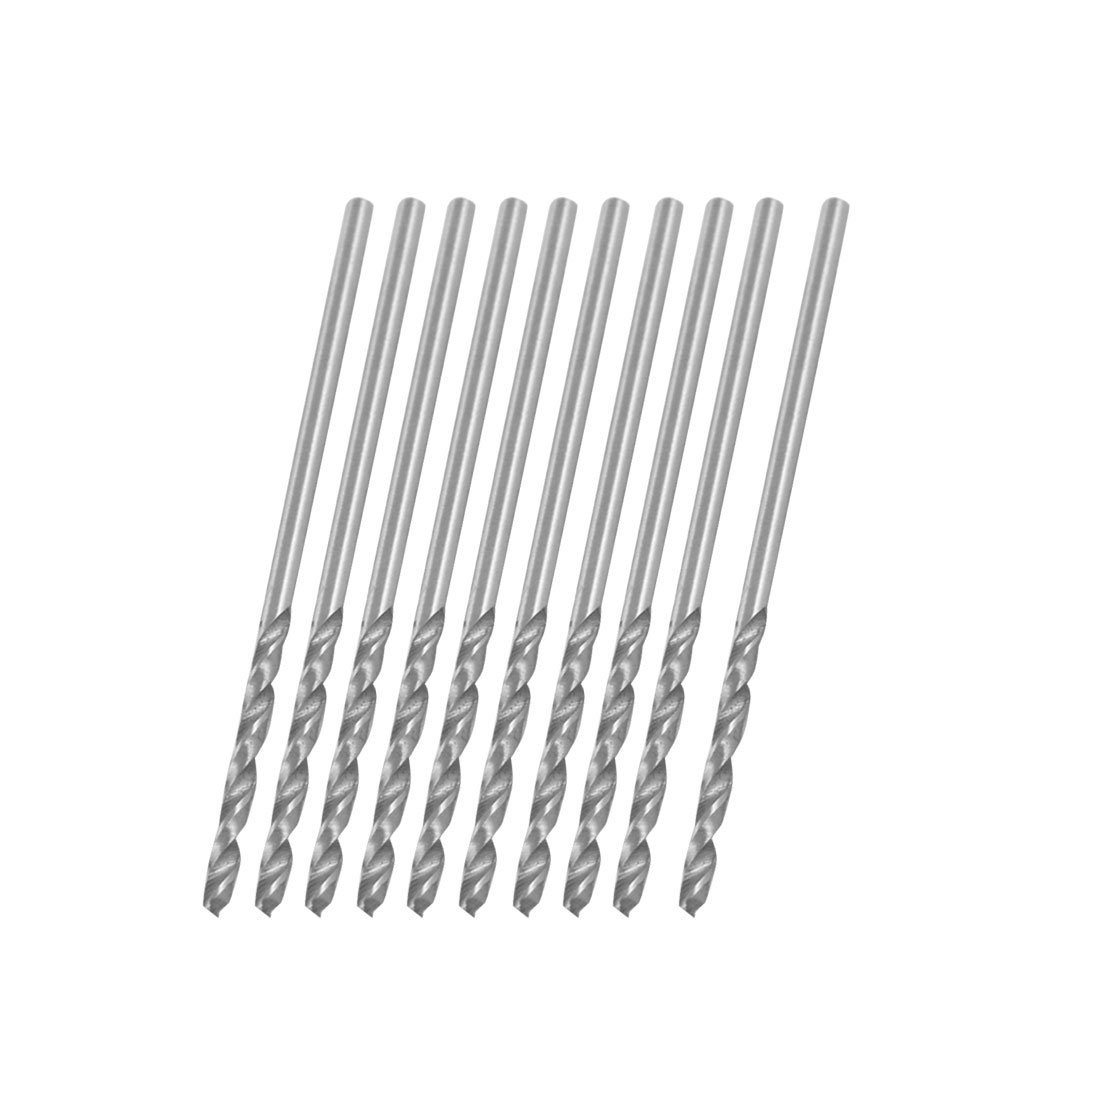 10 Pcs 1.25mm Straight Shank Spiral Twist Drill Bit Sourcingmap a12030500ux0846